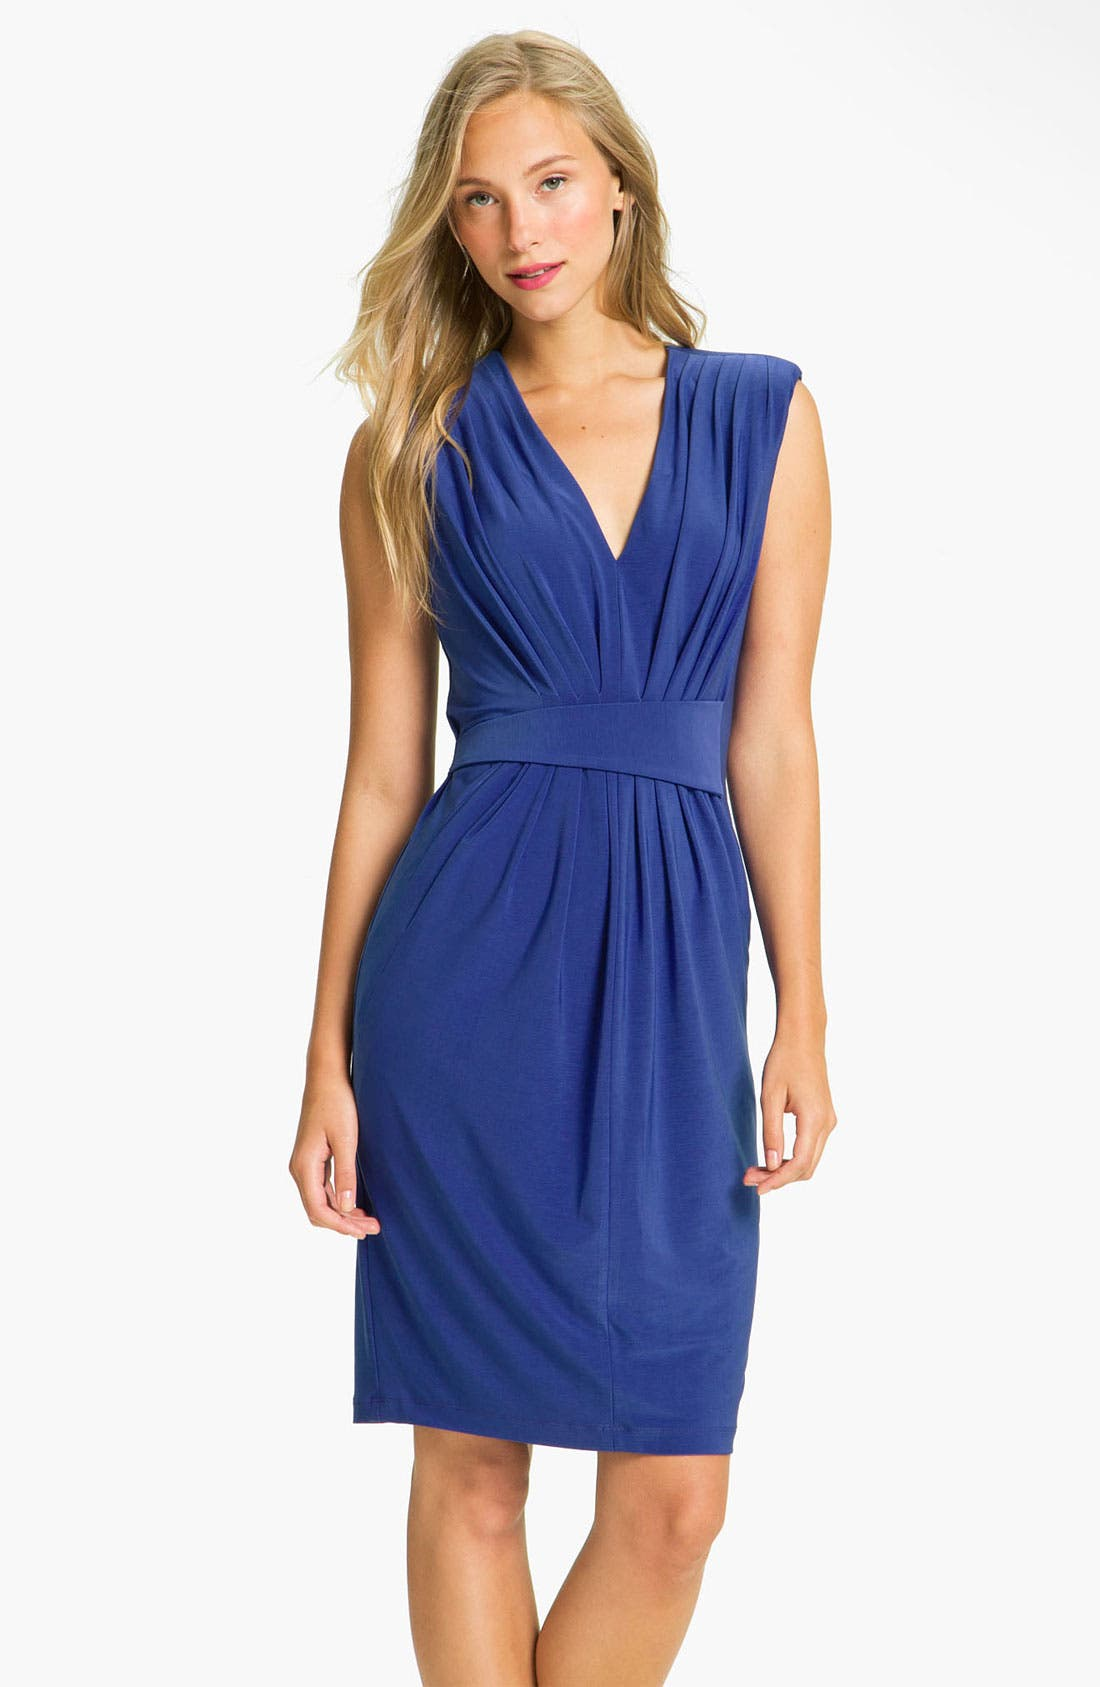 Alternate Image 1 Selected - Alex & Ava Pleated Jersey Sheath Dress